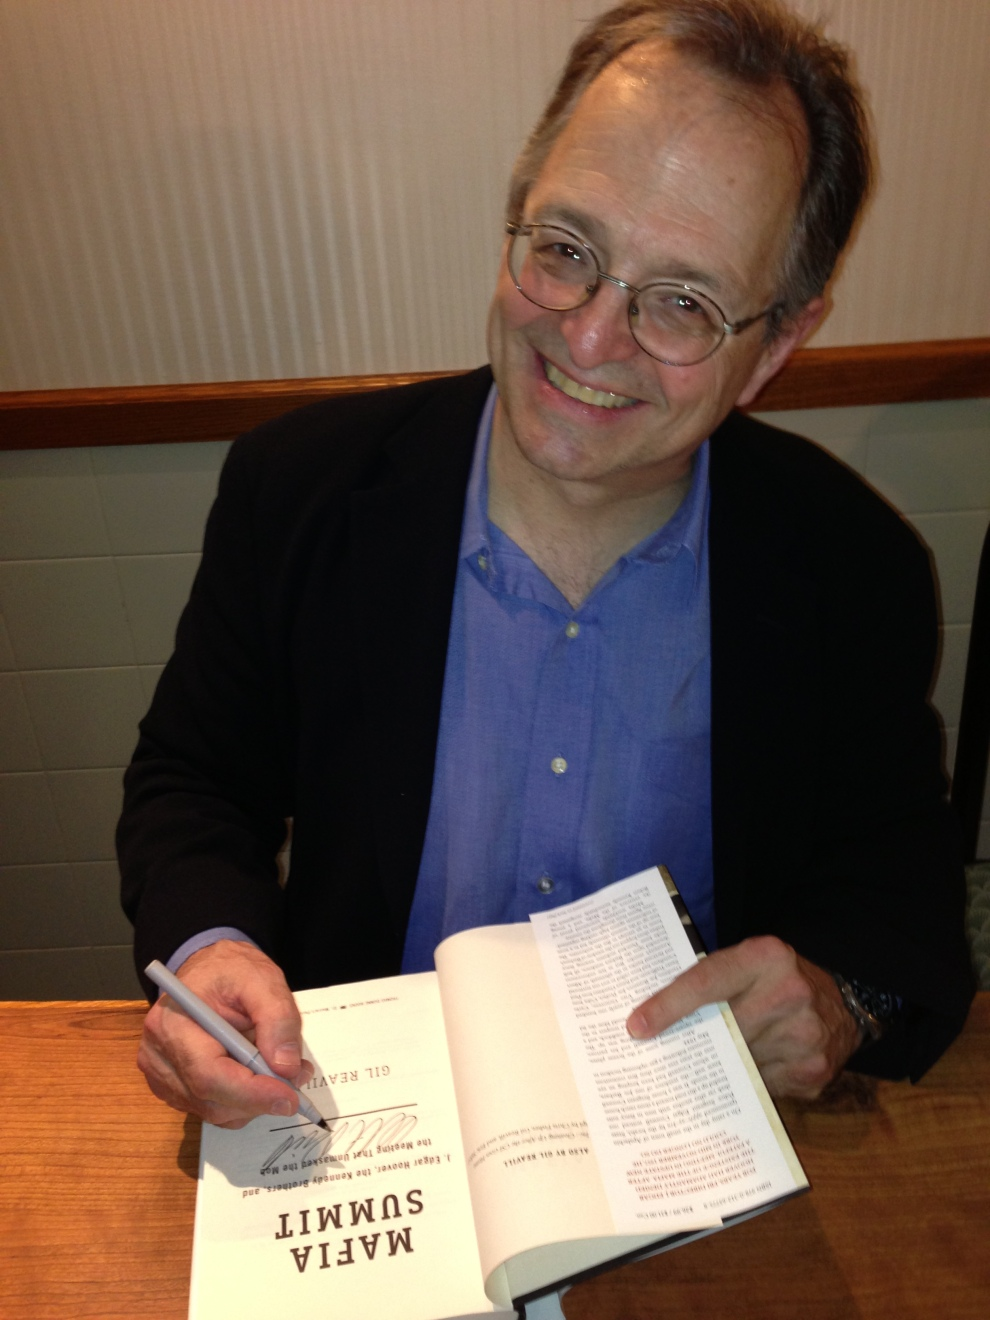 Gil signing